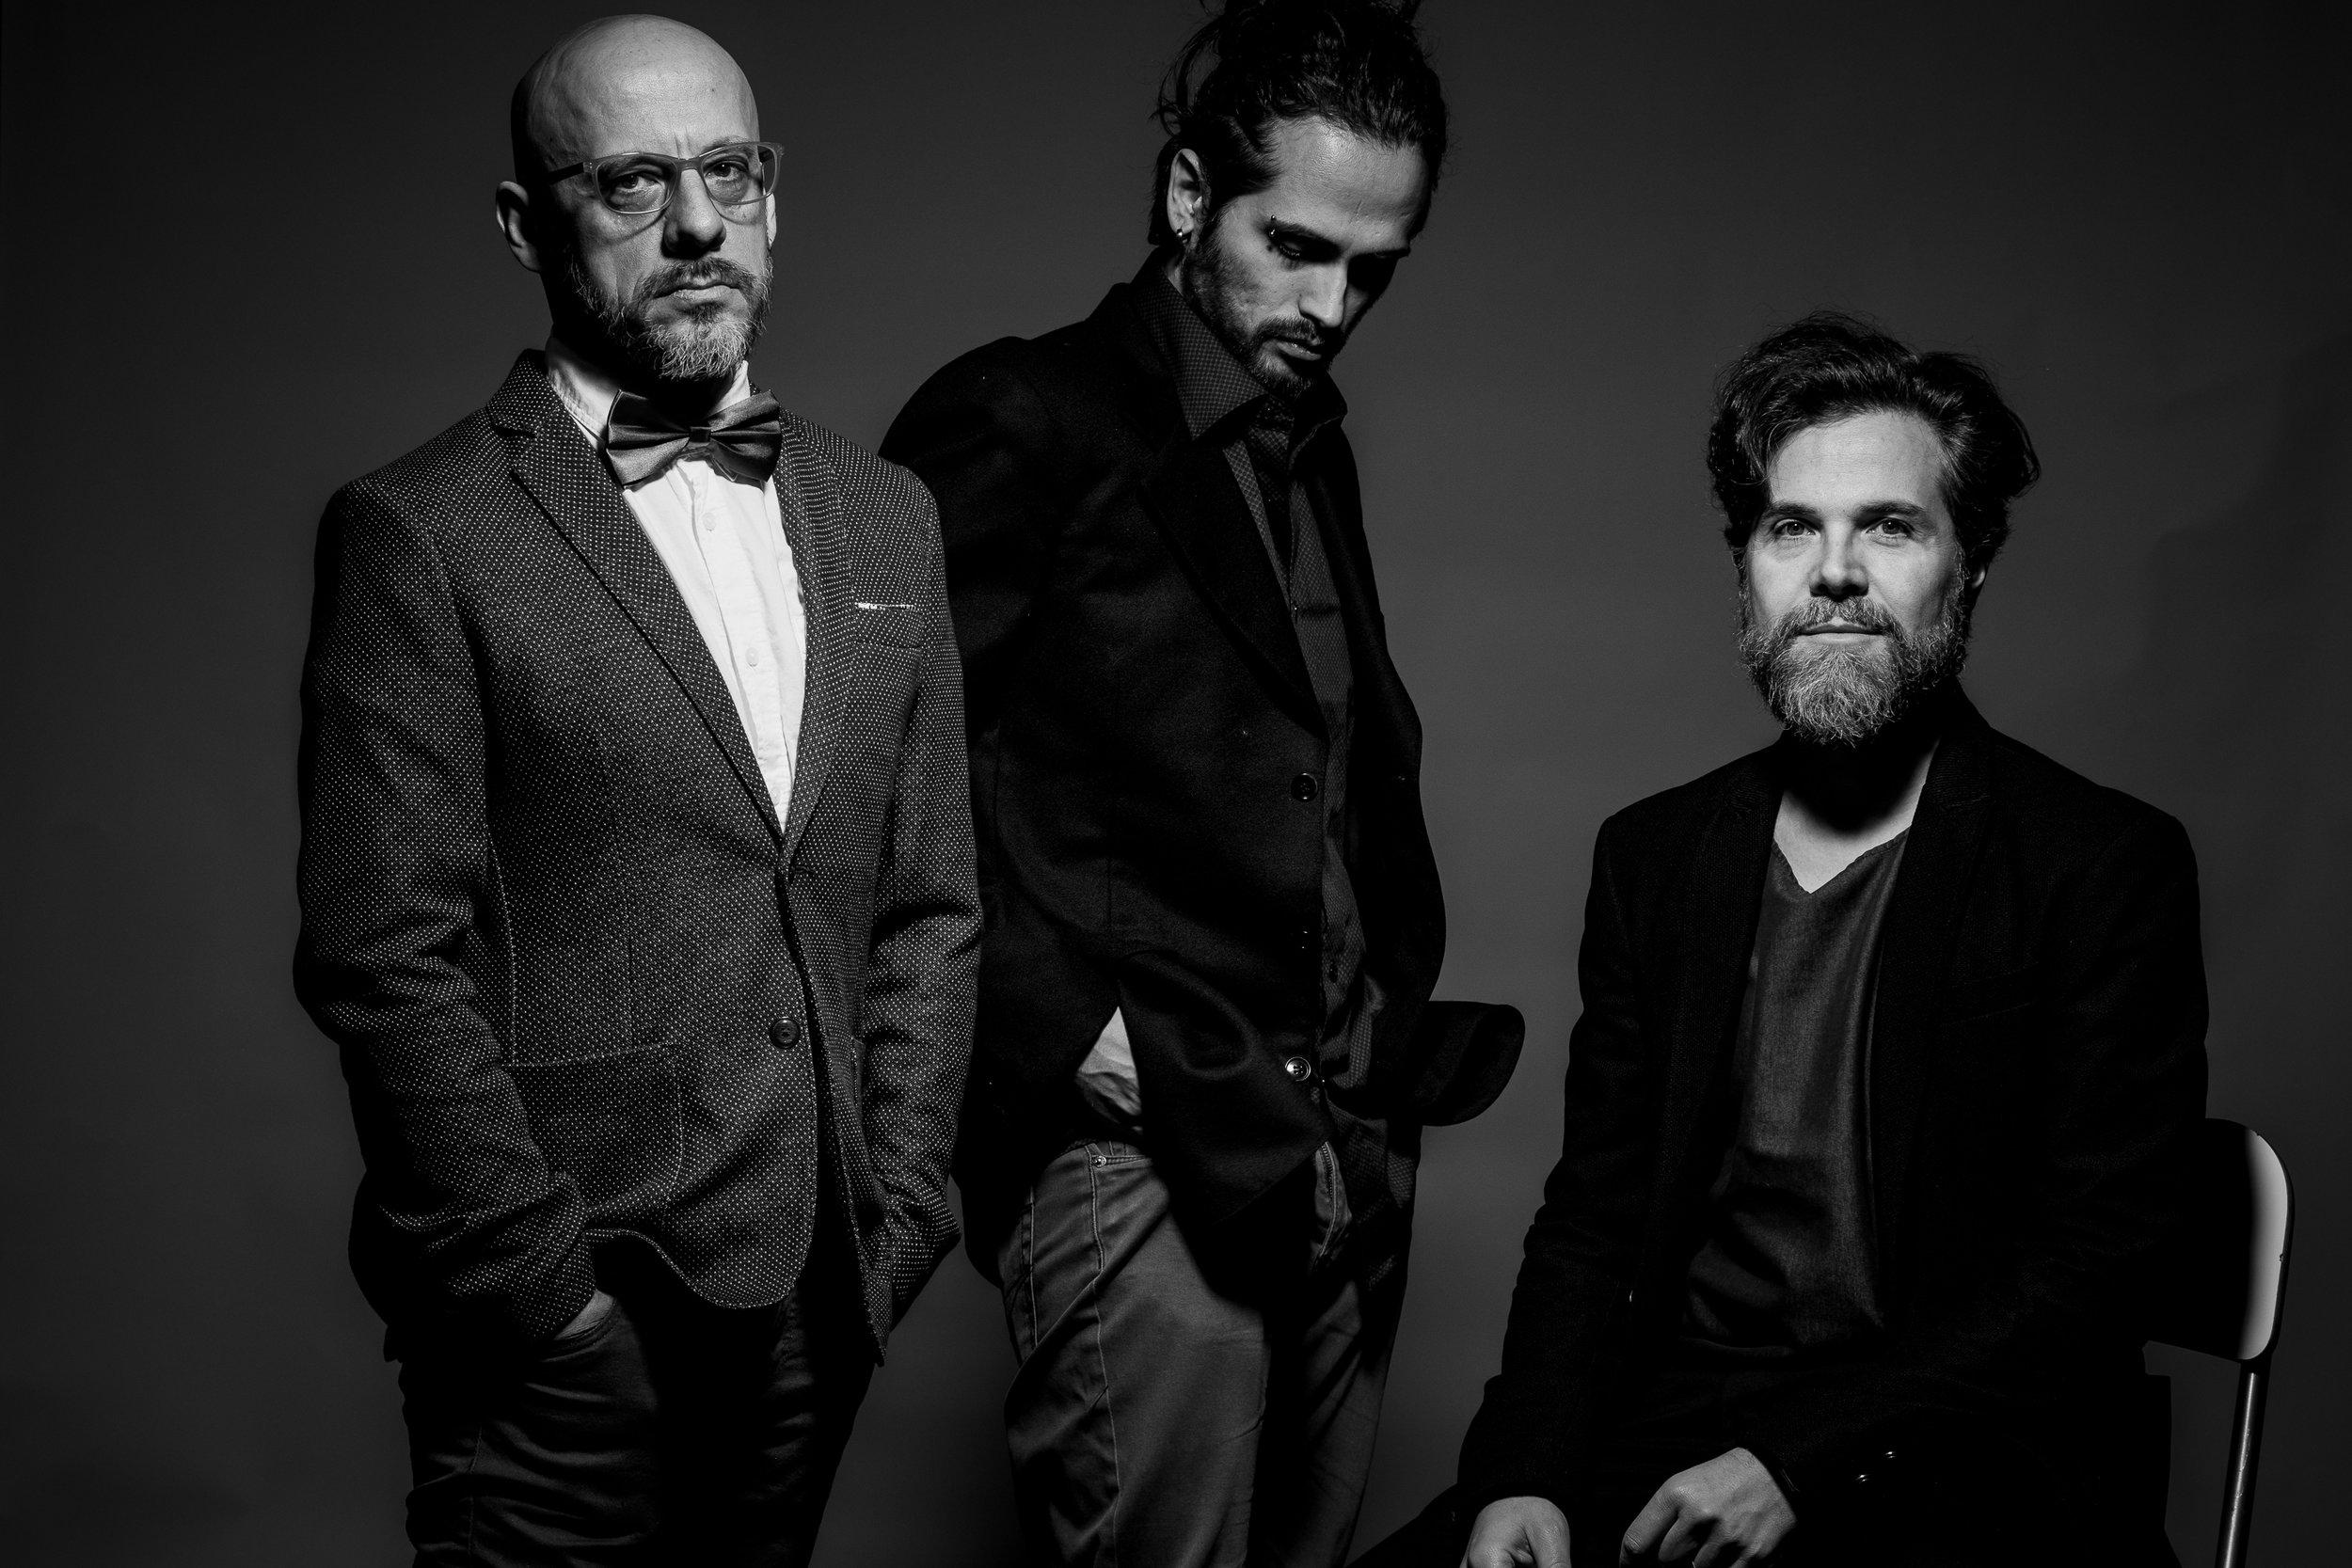 Andrea Manzoni Trio Live at RTVS in Bratislava   27.09.18